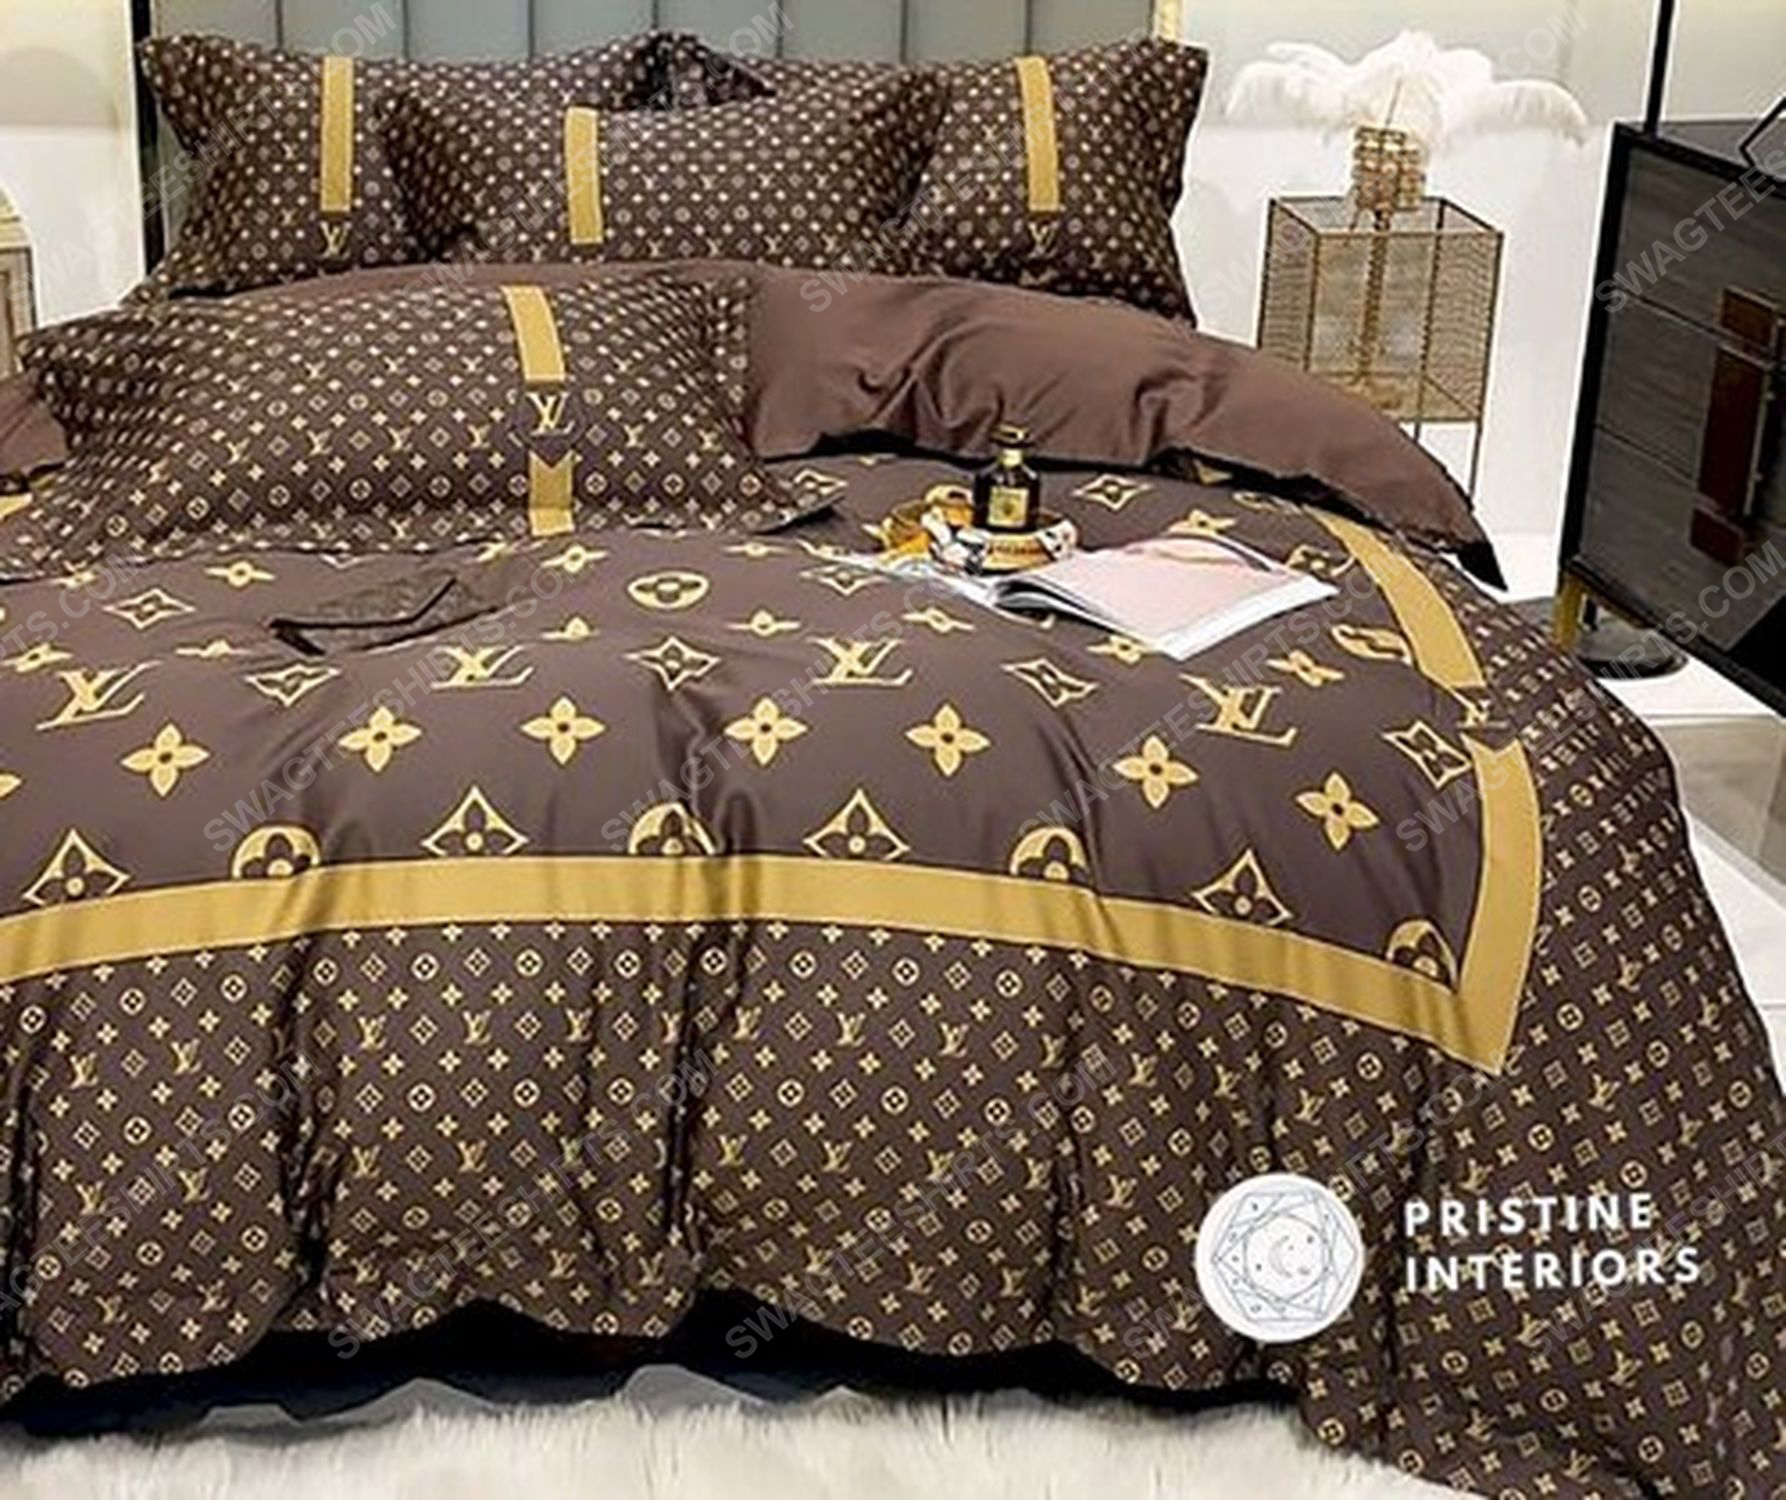 Lv monogram brown version full print duvet cover bedding set 3 - Copy